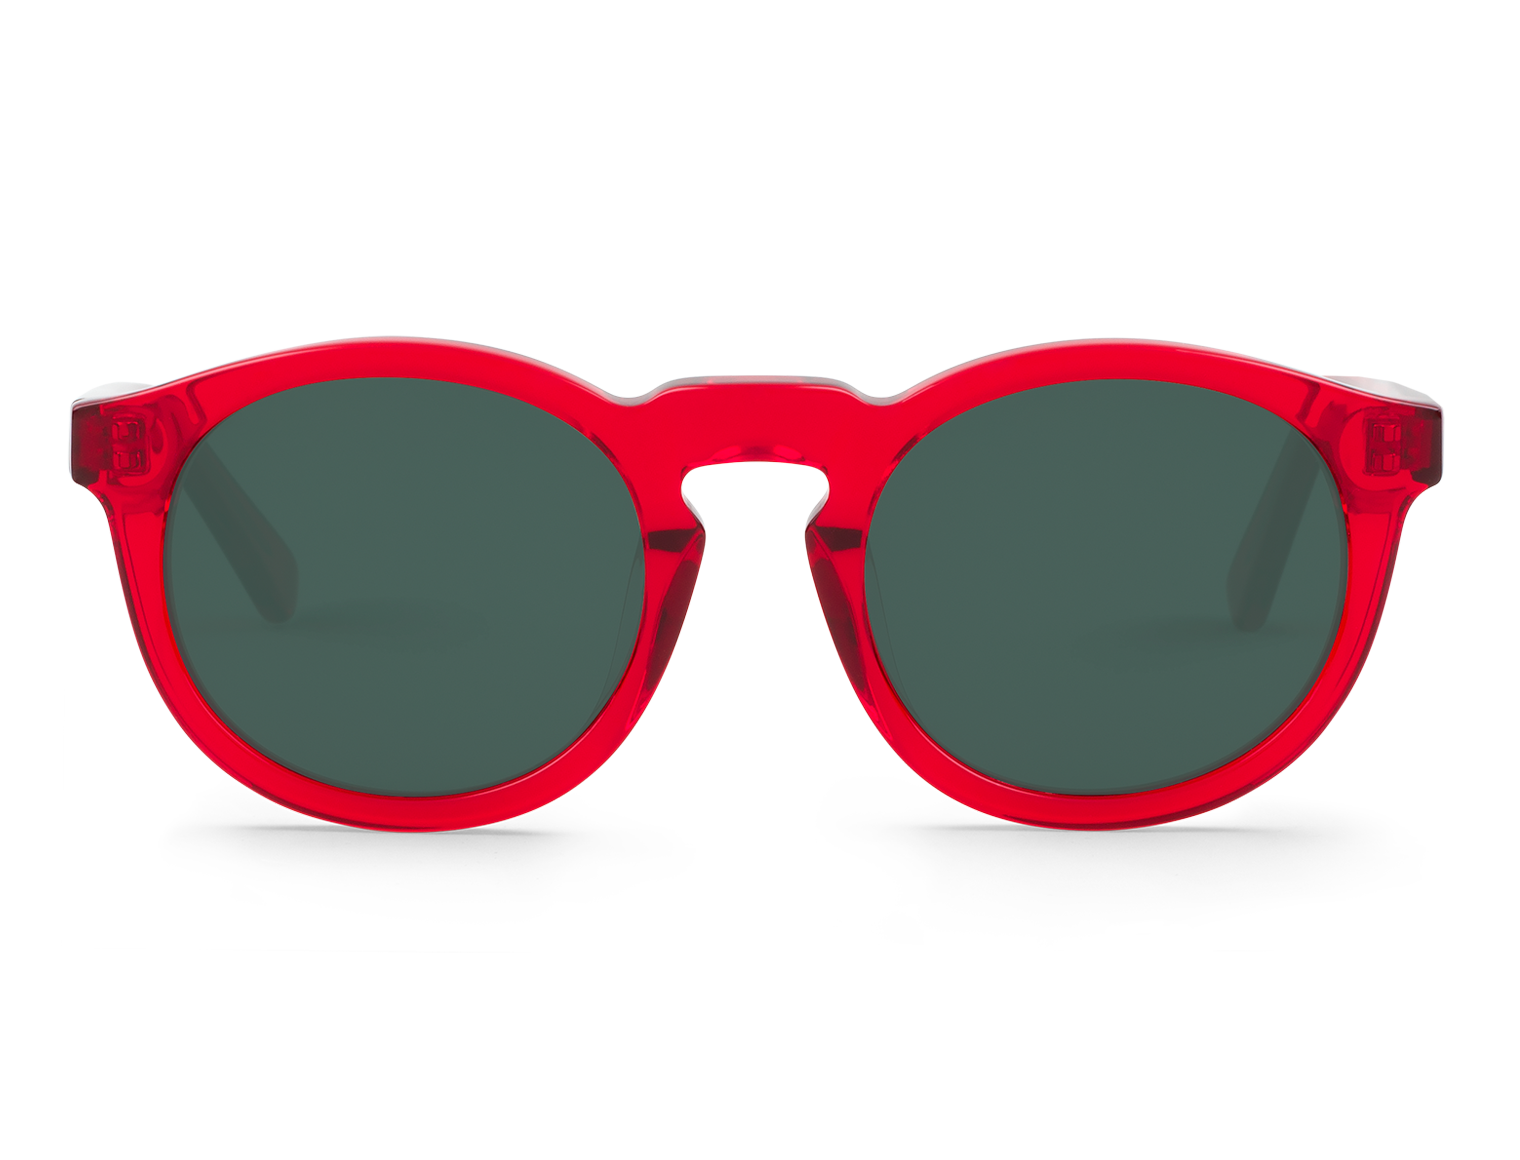 JORDAAN | RUBY with classical lenses